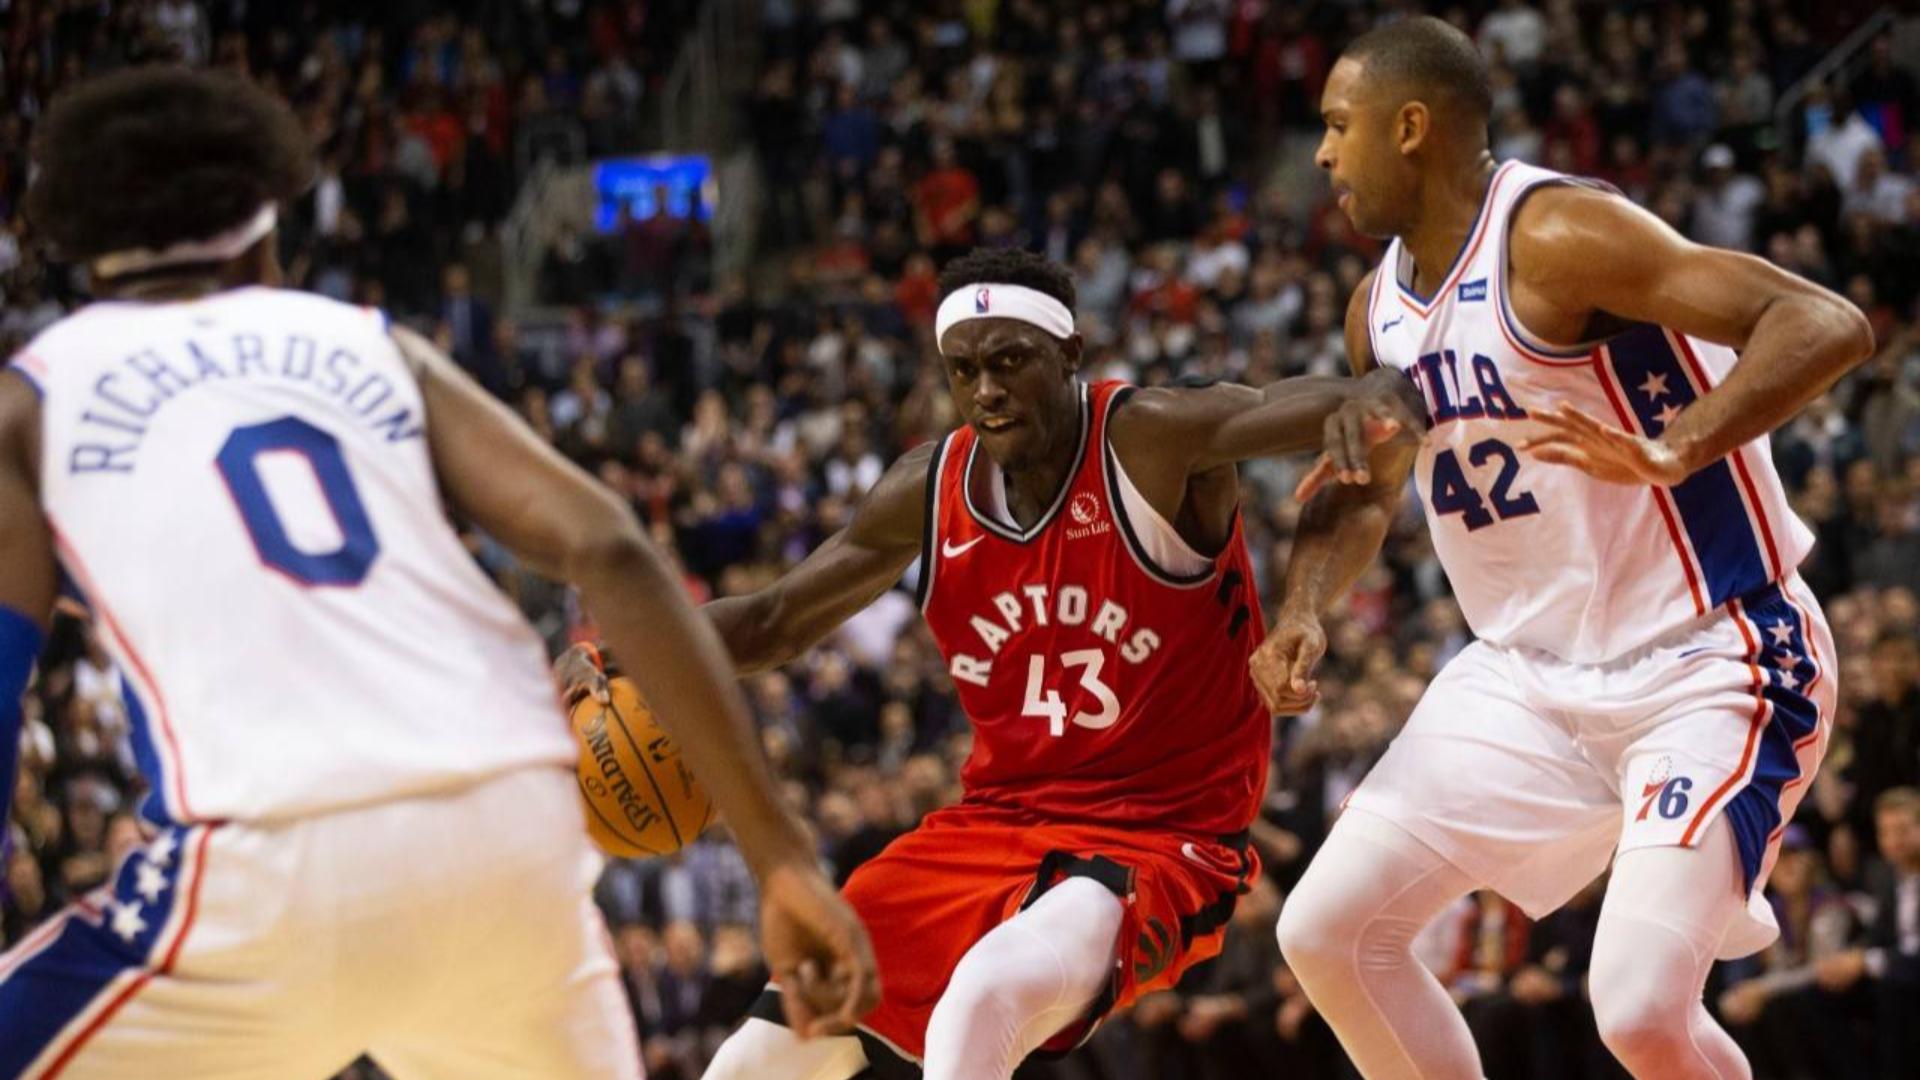 2019-2020 NBA常规赛 多伦多猛龙 VS 费城76人 集锦